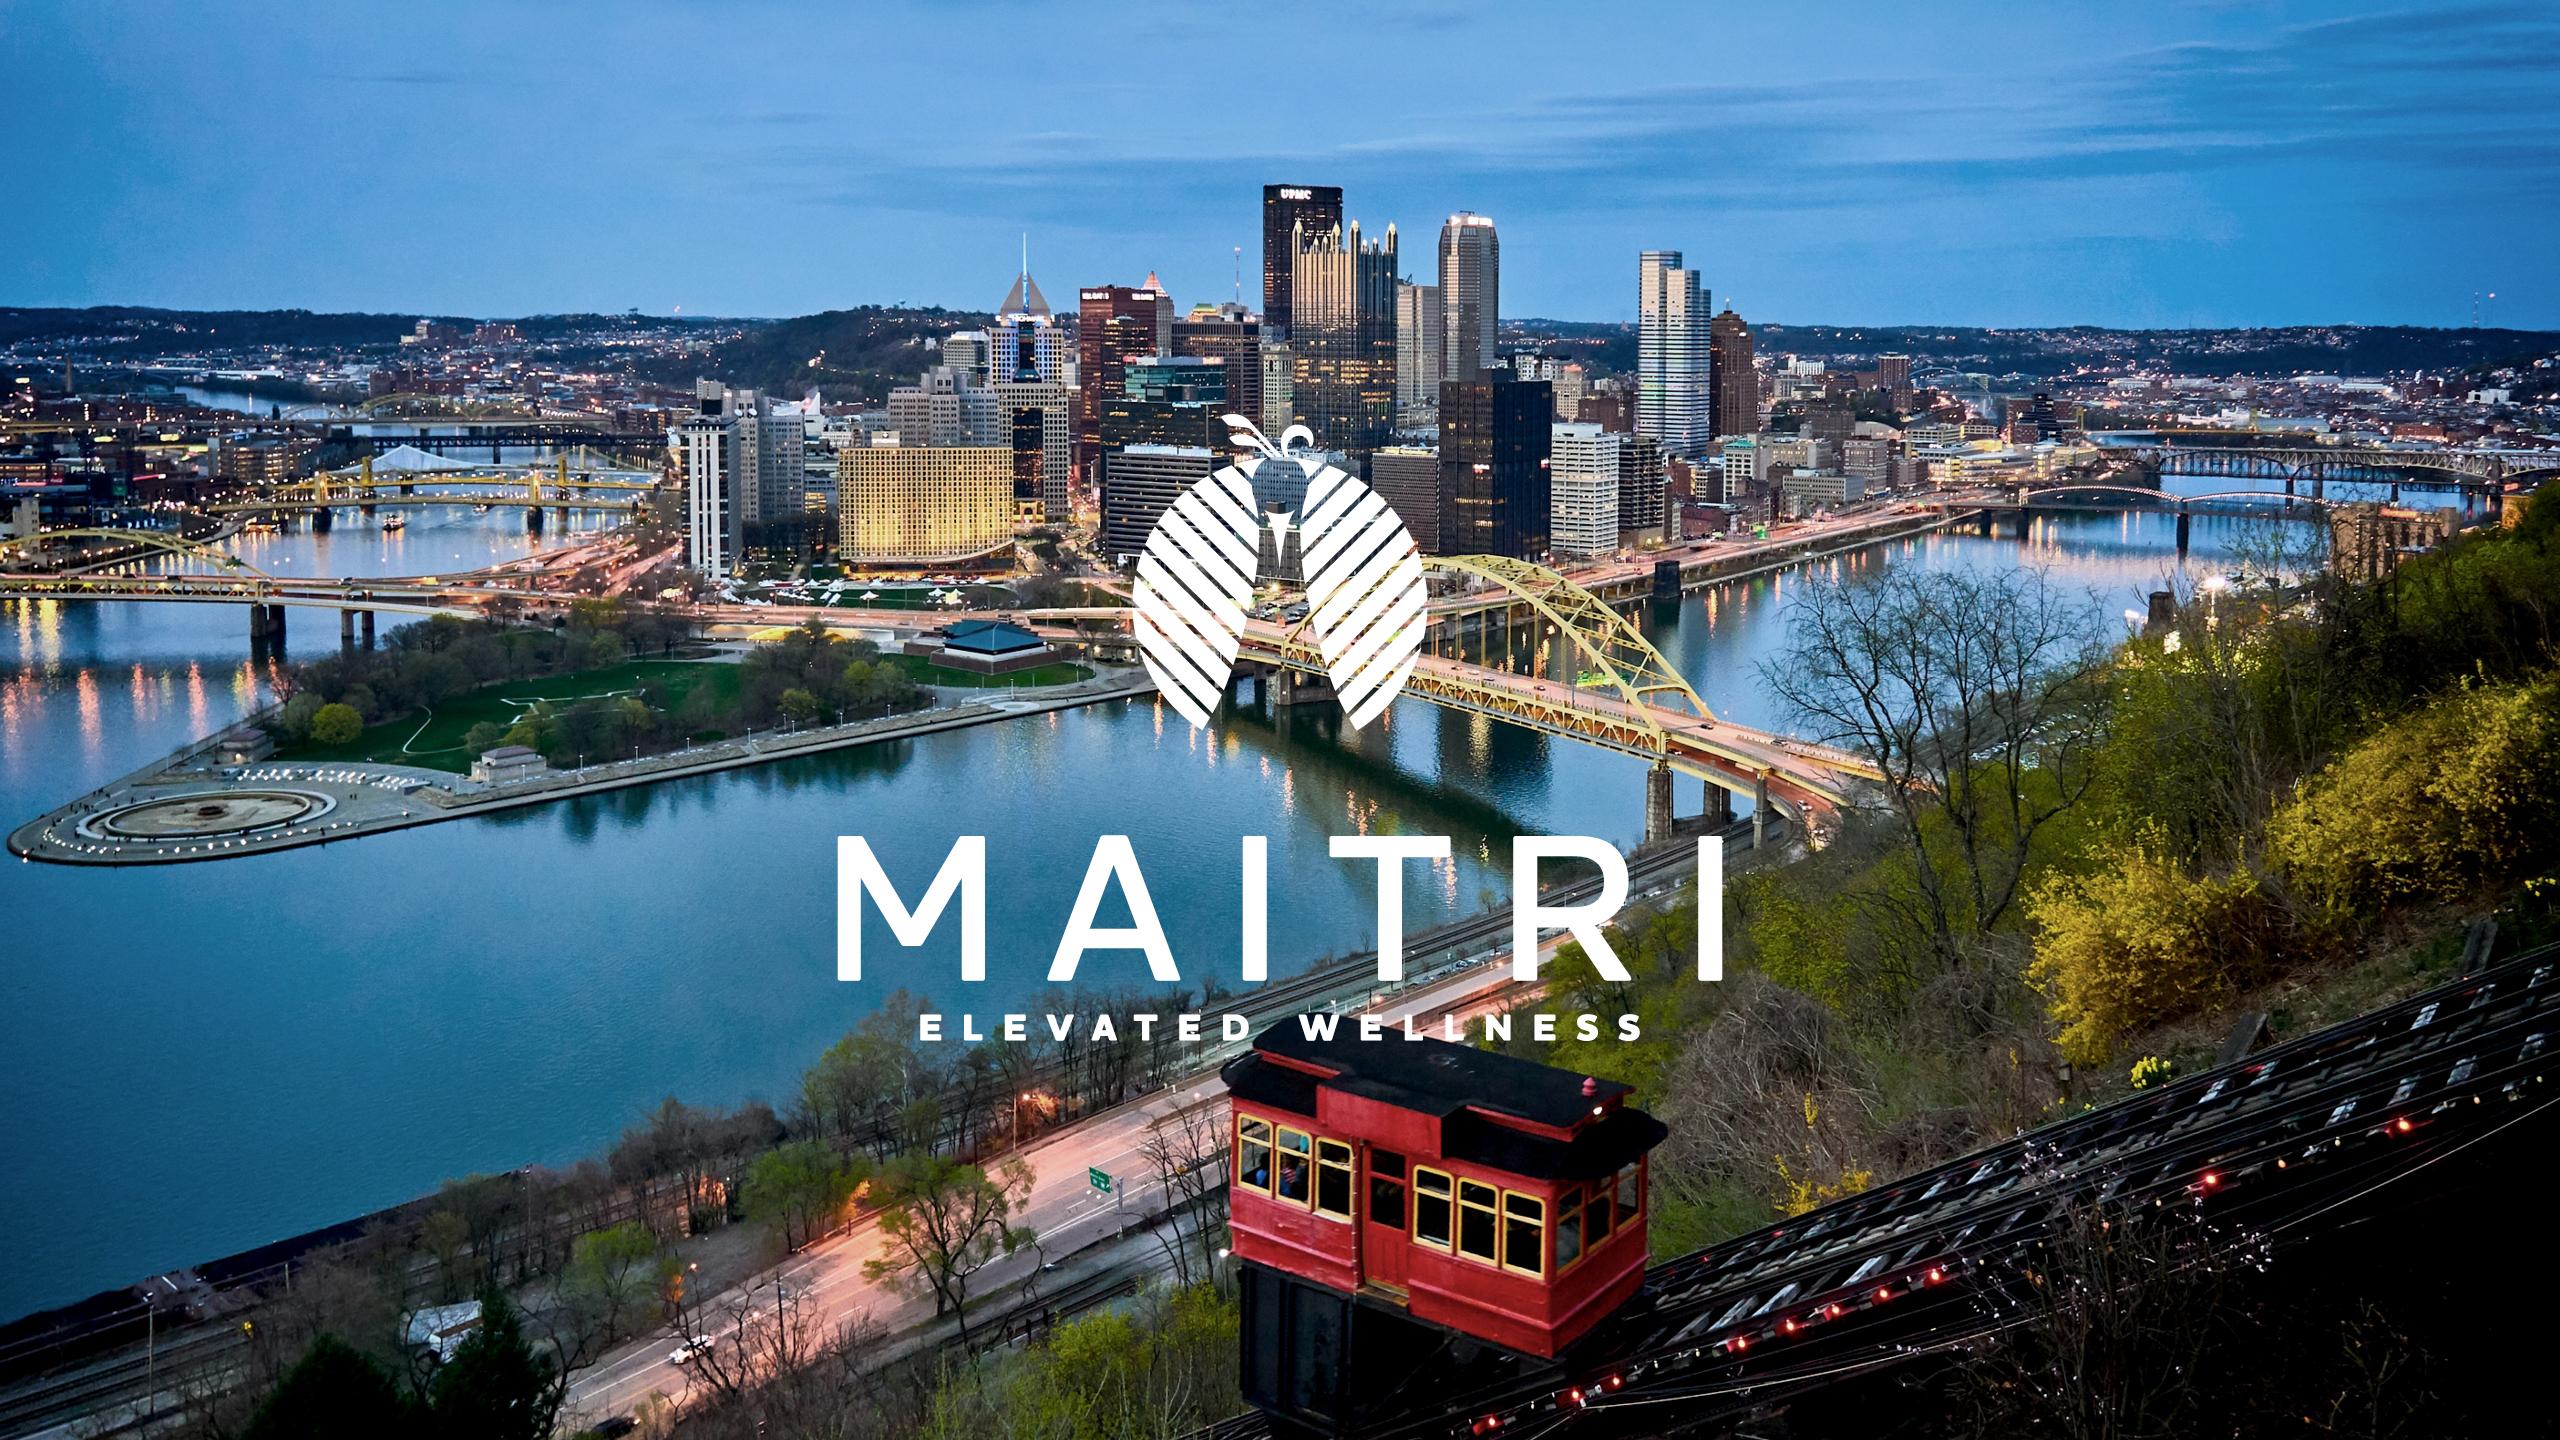 Maitri Medicinals Brand Identity by High Road Design Studio